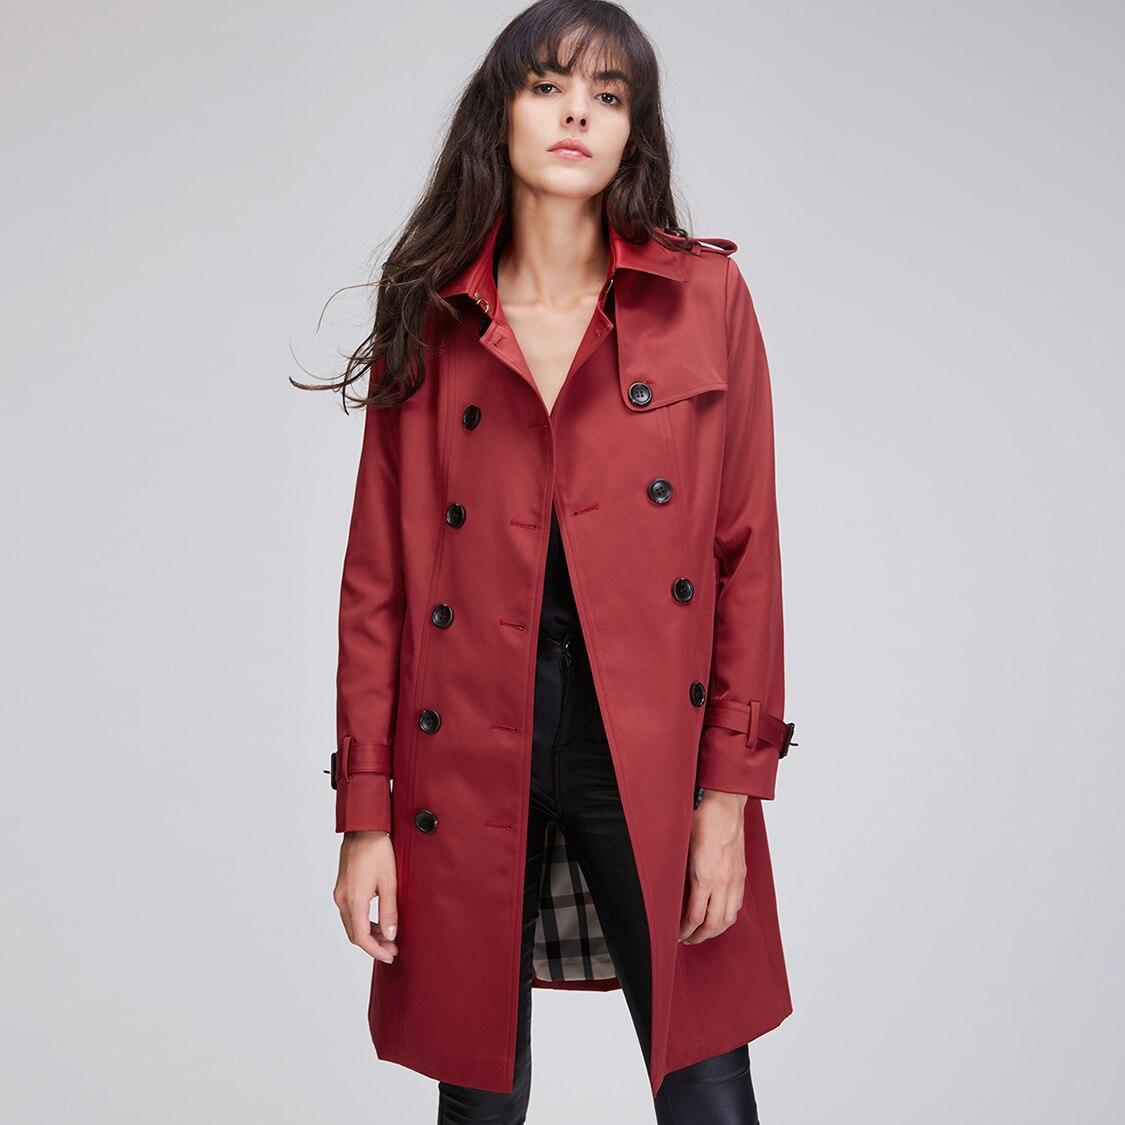 JAZZEVAR 2019 الخريف الجديدة عالية أزياء العلامة التجارية امرأة الكلاسيكية مزدوجة الصدر خندق معطف المطر ماء الأعمال قميص-في معطف مبطن من ملابس نسائية على  مجموعة 2